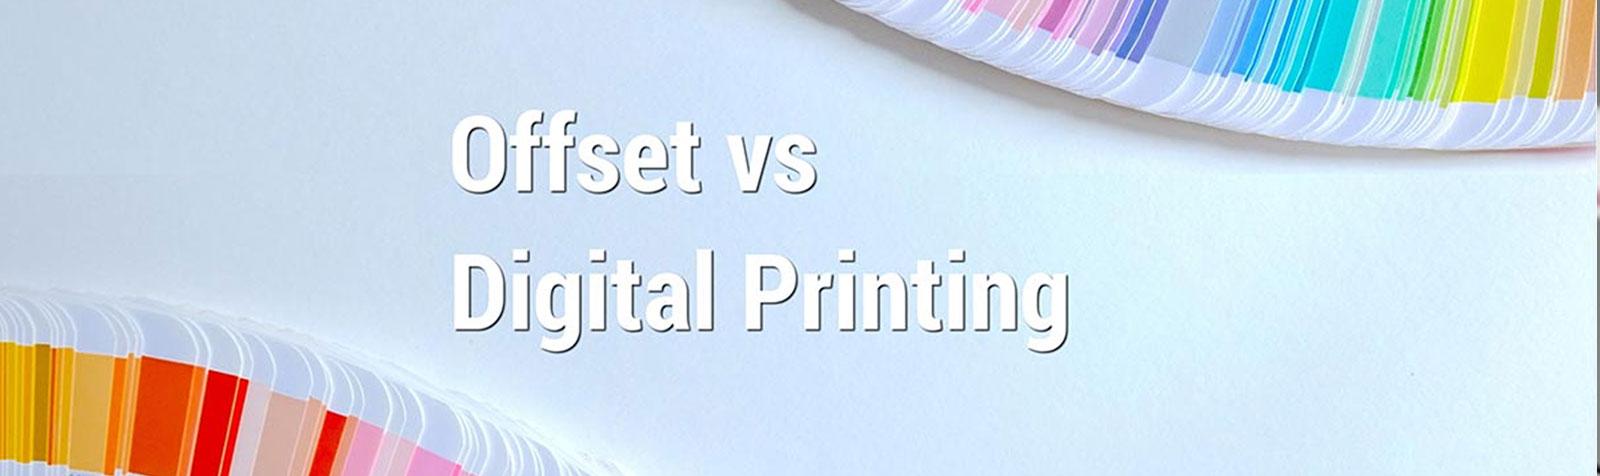 http://www.wizardz.co.za/wp-content/uploads/2019/07/Offset-vs-digital-printing.jpg